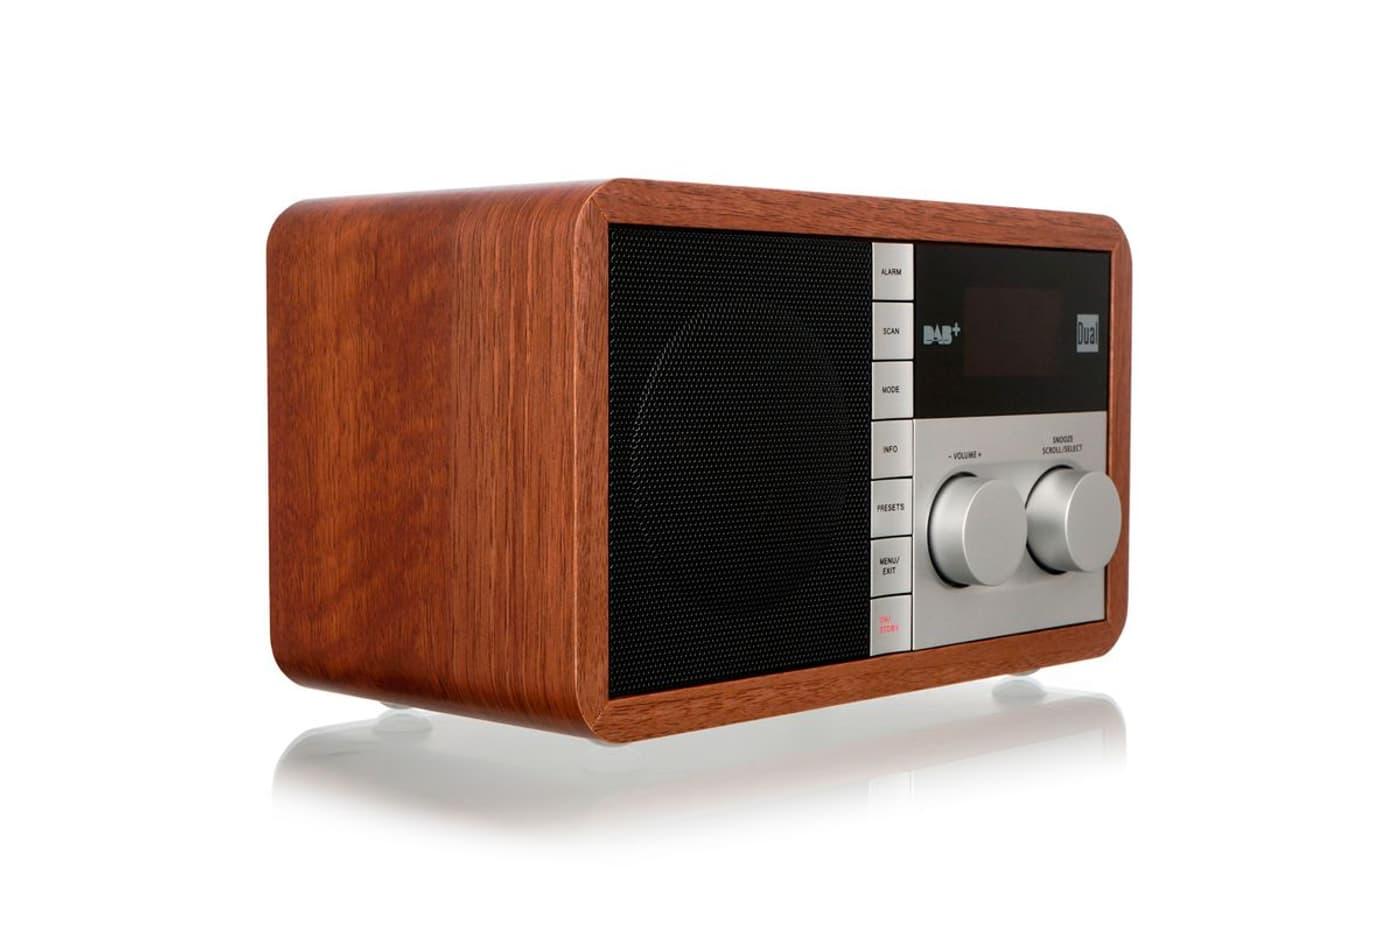 dual dab 32 radio dab migros. Black Bedroom Furniture Sets. Home Design Ideas